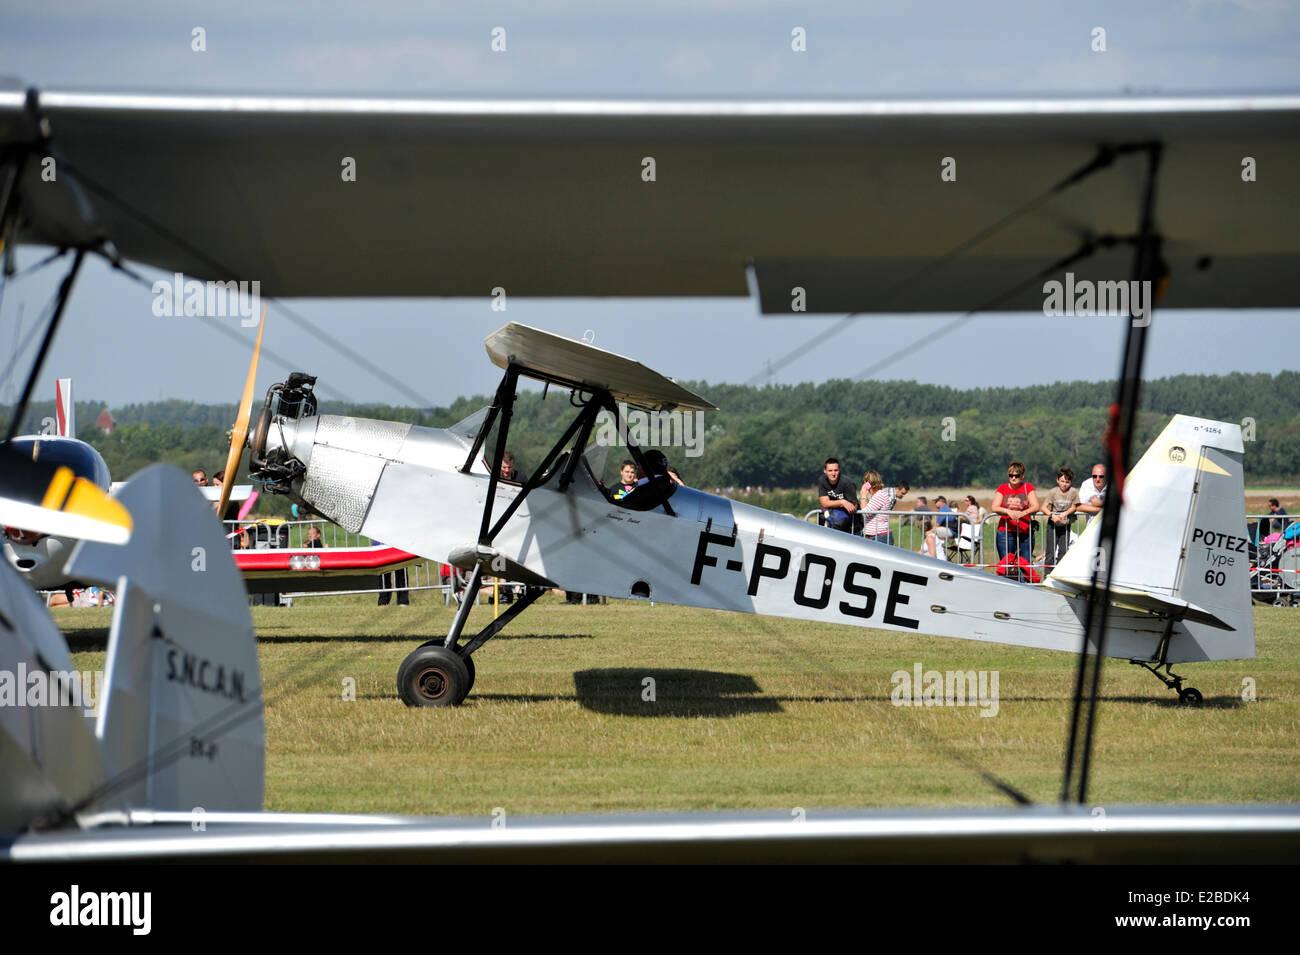 France, Pas de Calais, Lens, air meeting, biplane Potez type 60 on the ground - Stock Image